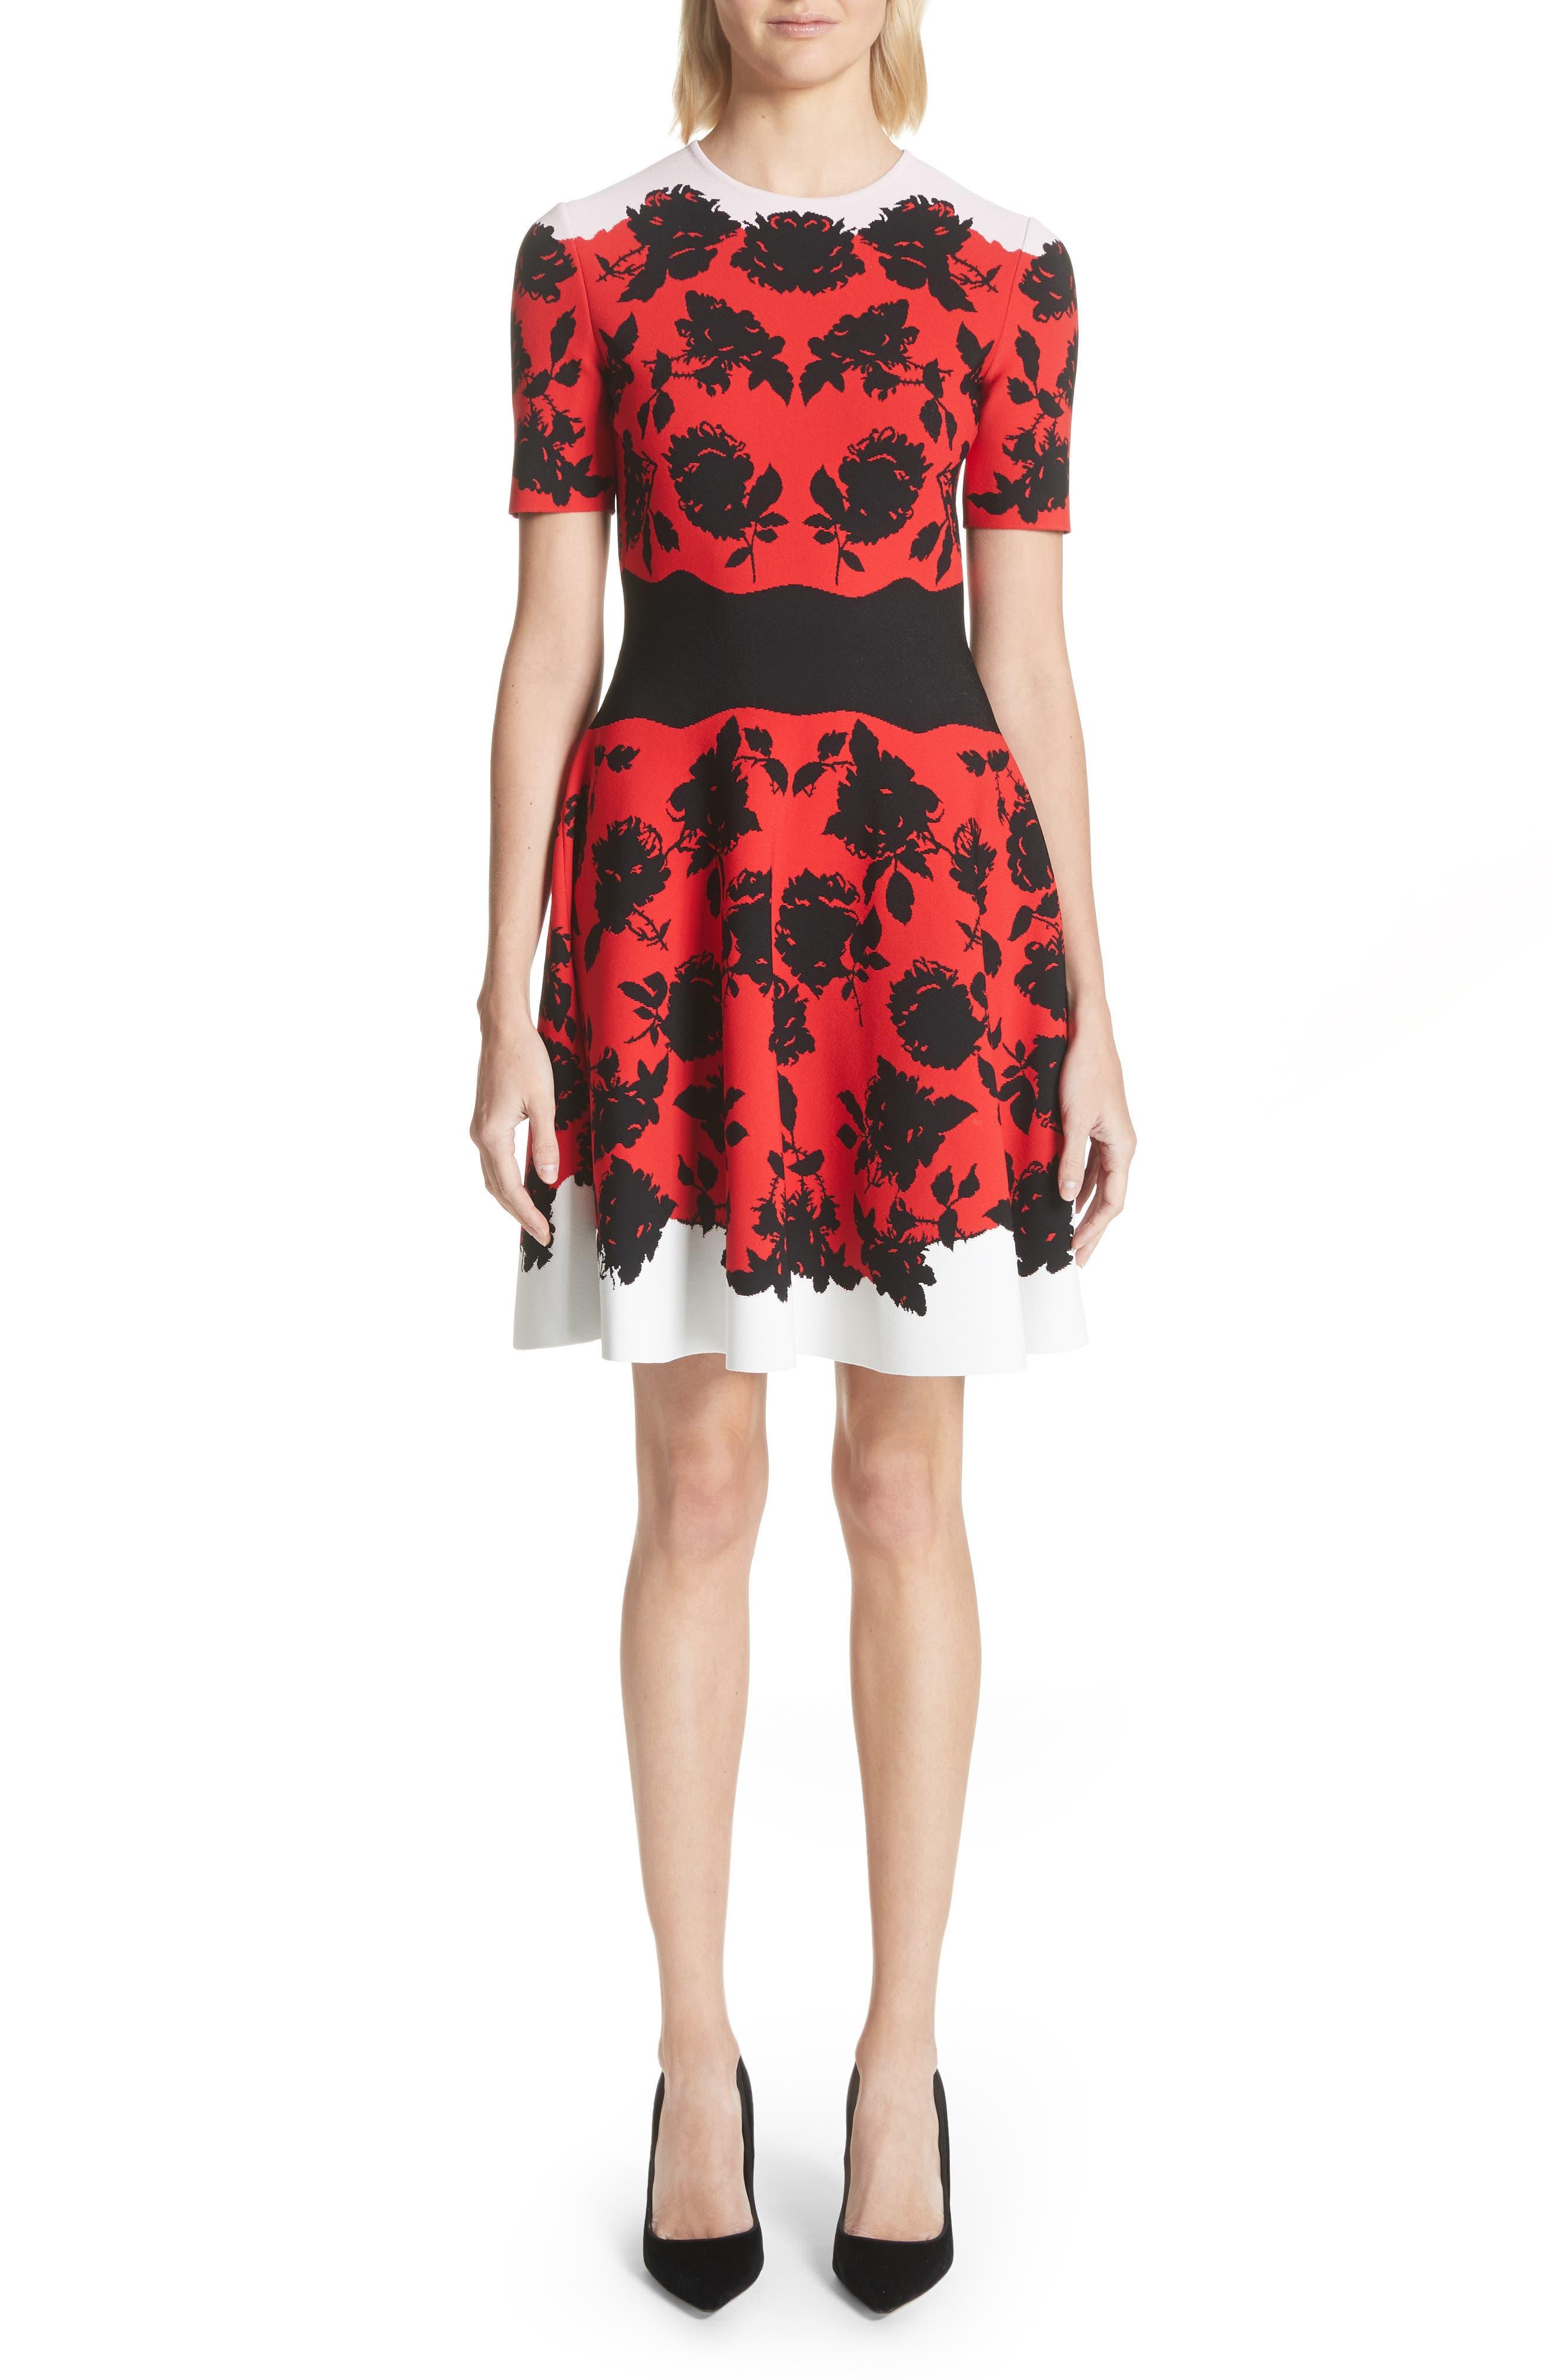 Rose Jacquard Knit Flounce Dress,                             Main thumbnail 1, color,                             Red/ Black/ Ivory/ Pink